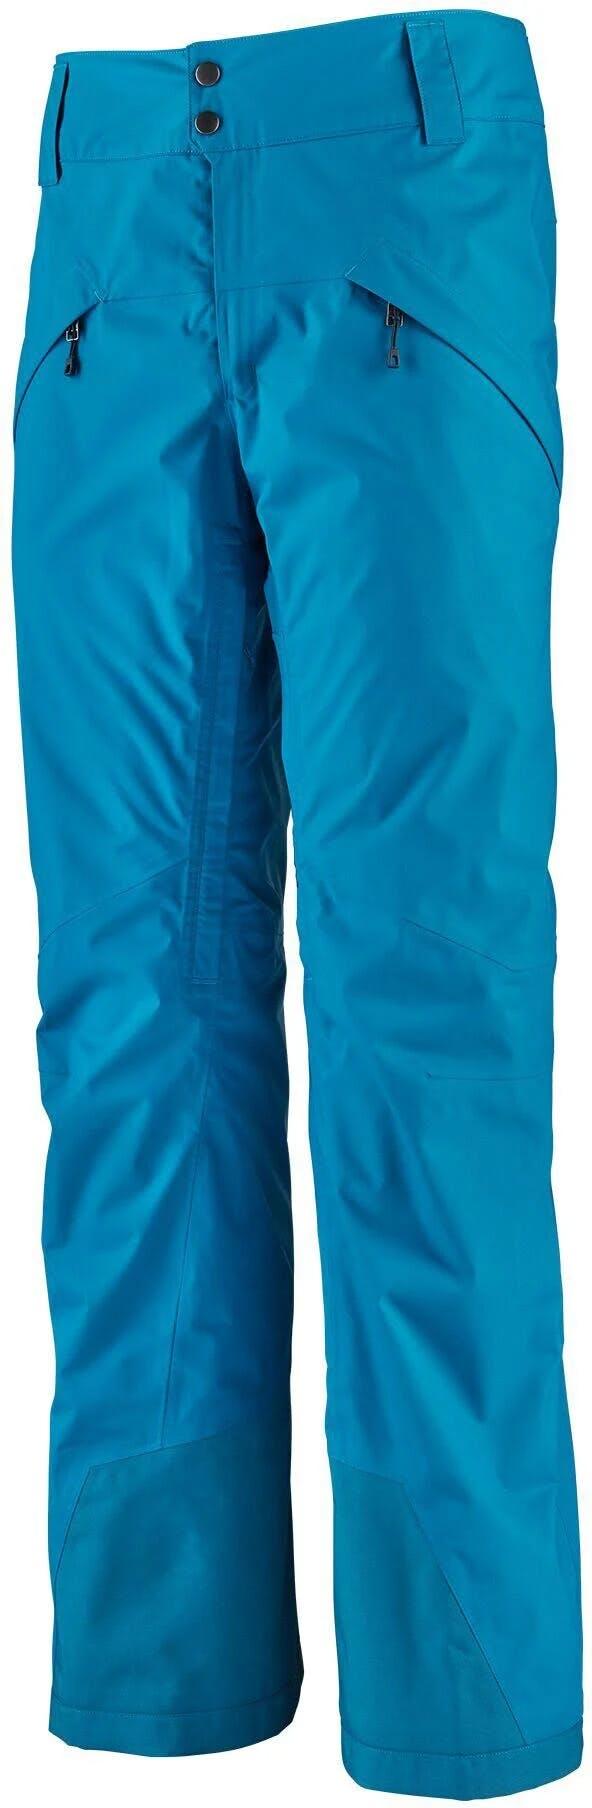 Patagonia Men's Snowshot Pants Blue L